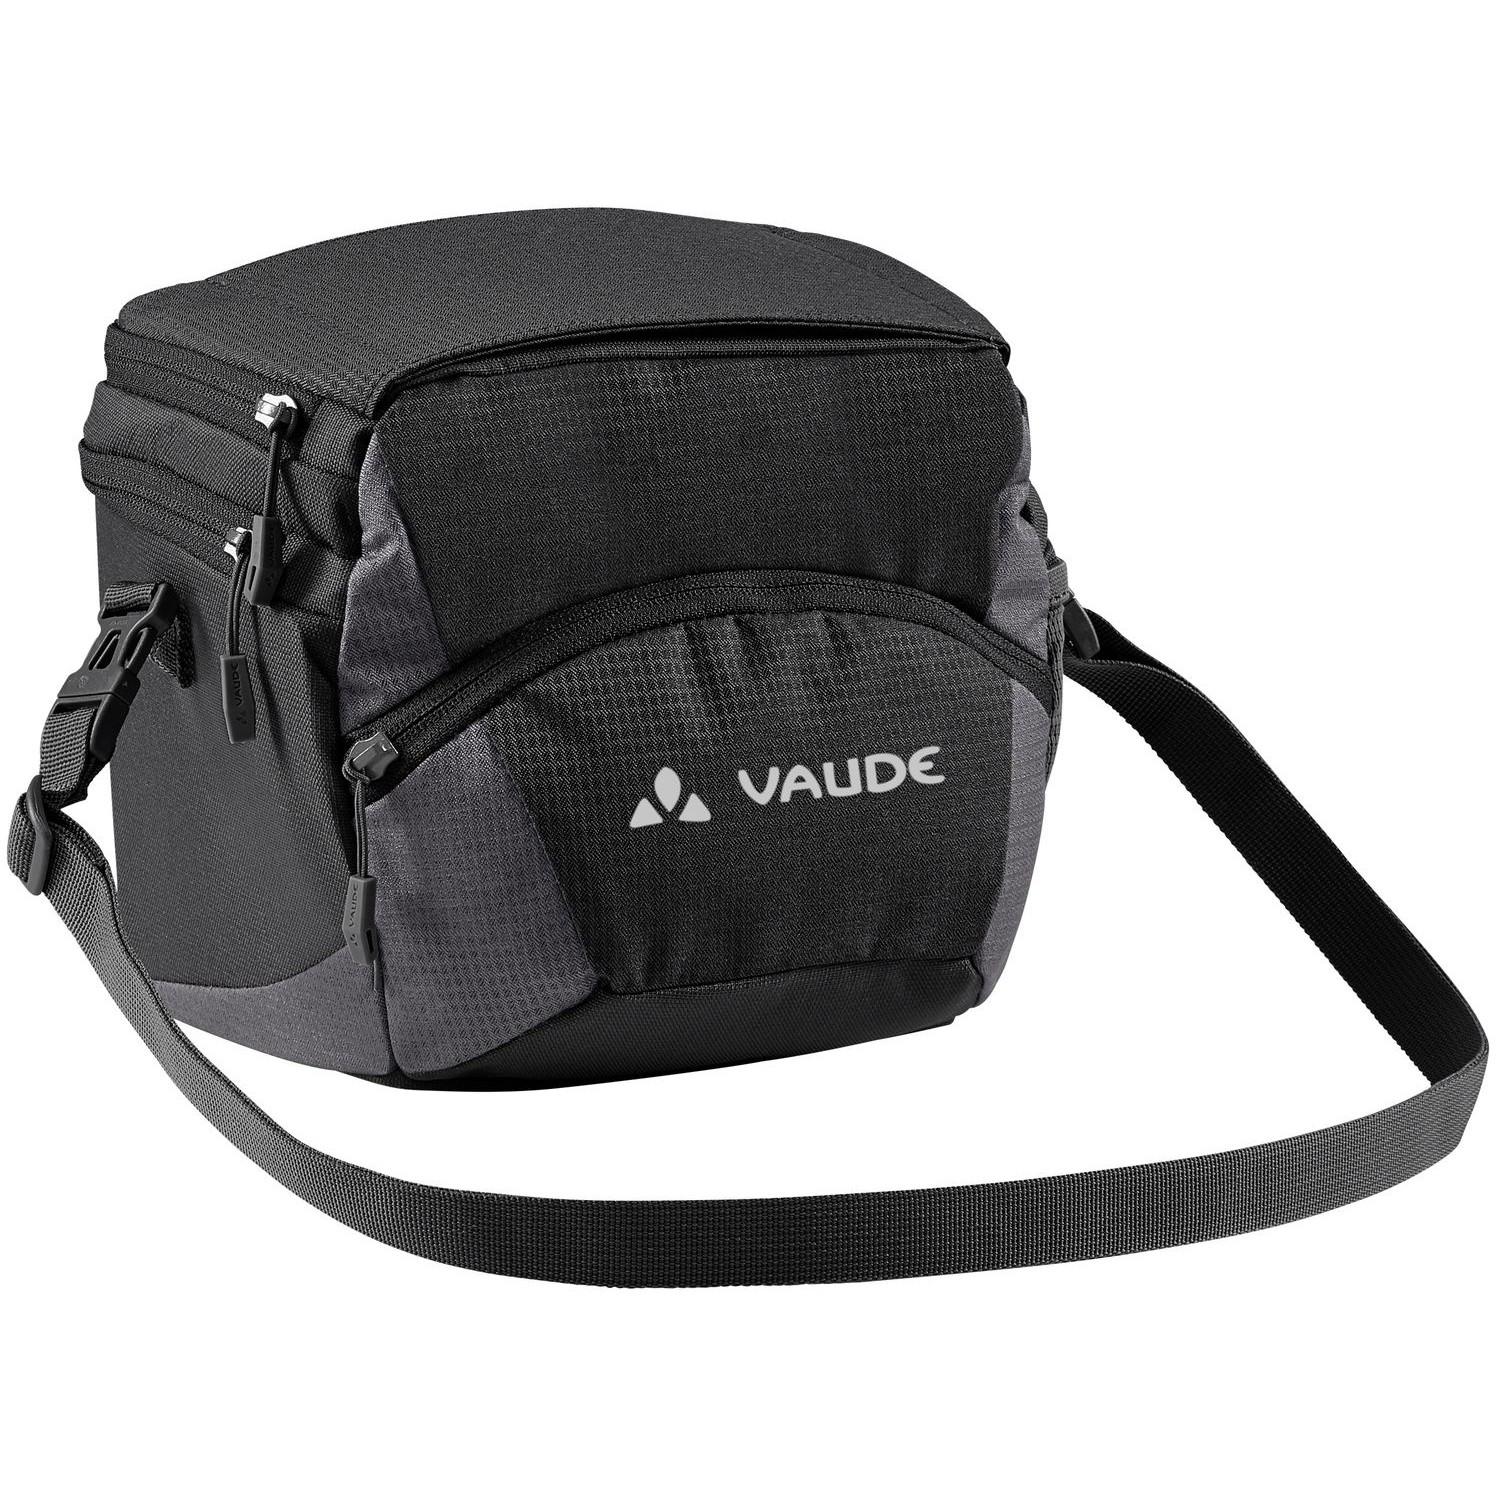 Vaude OnTour Box M (KLICKfix ready) Handlebar Bag - black